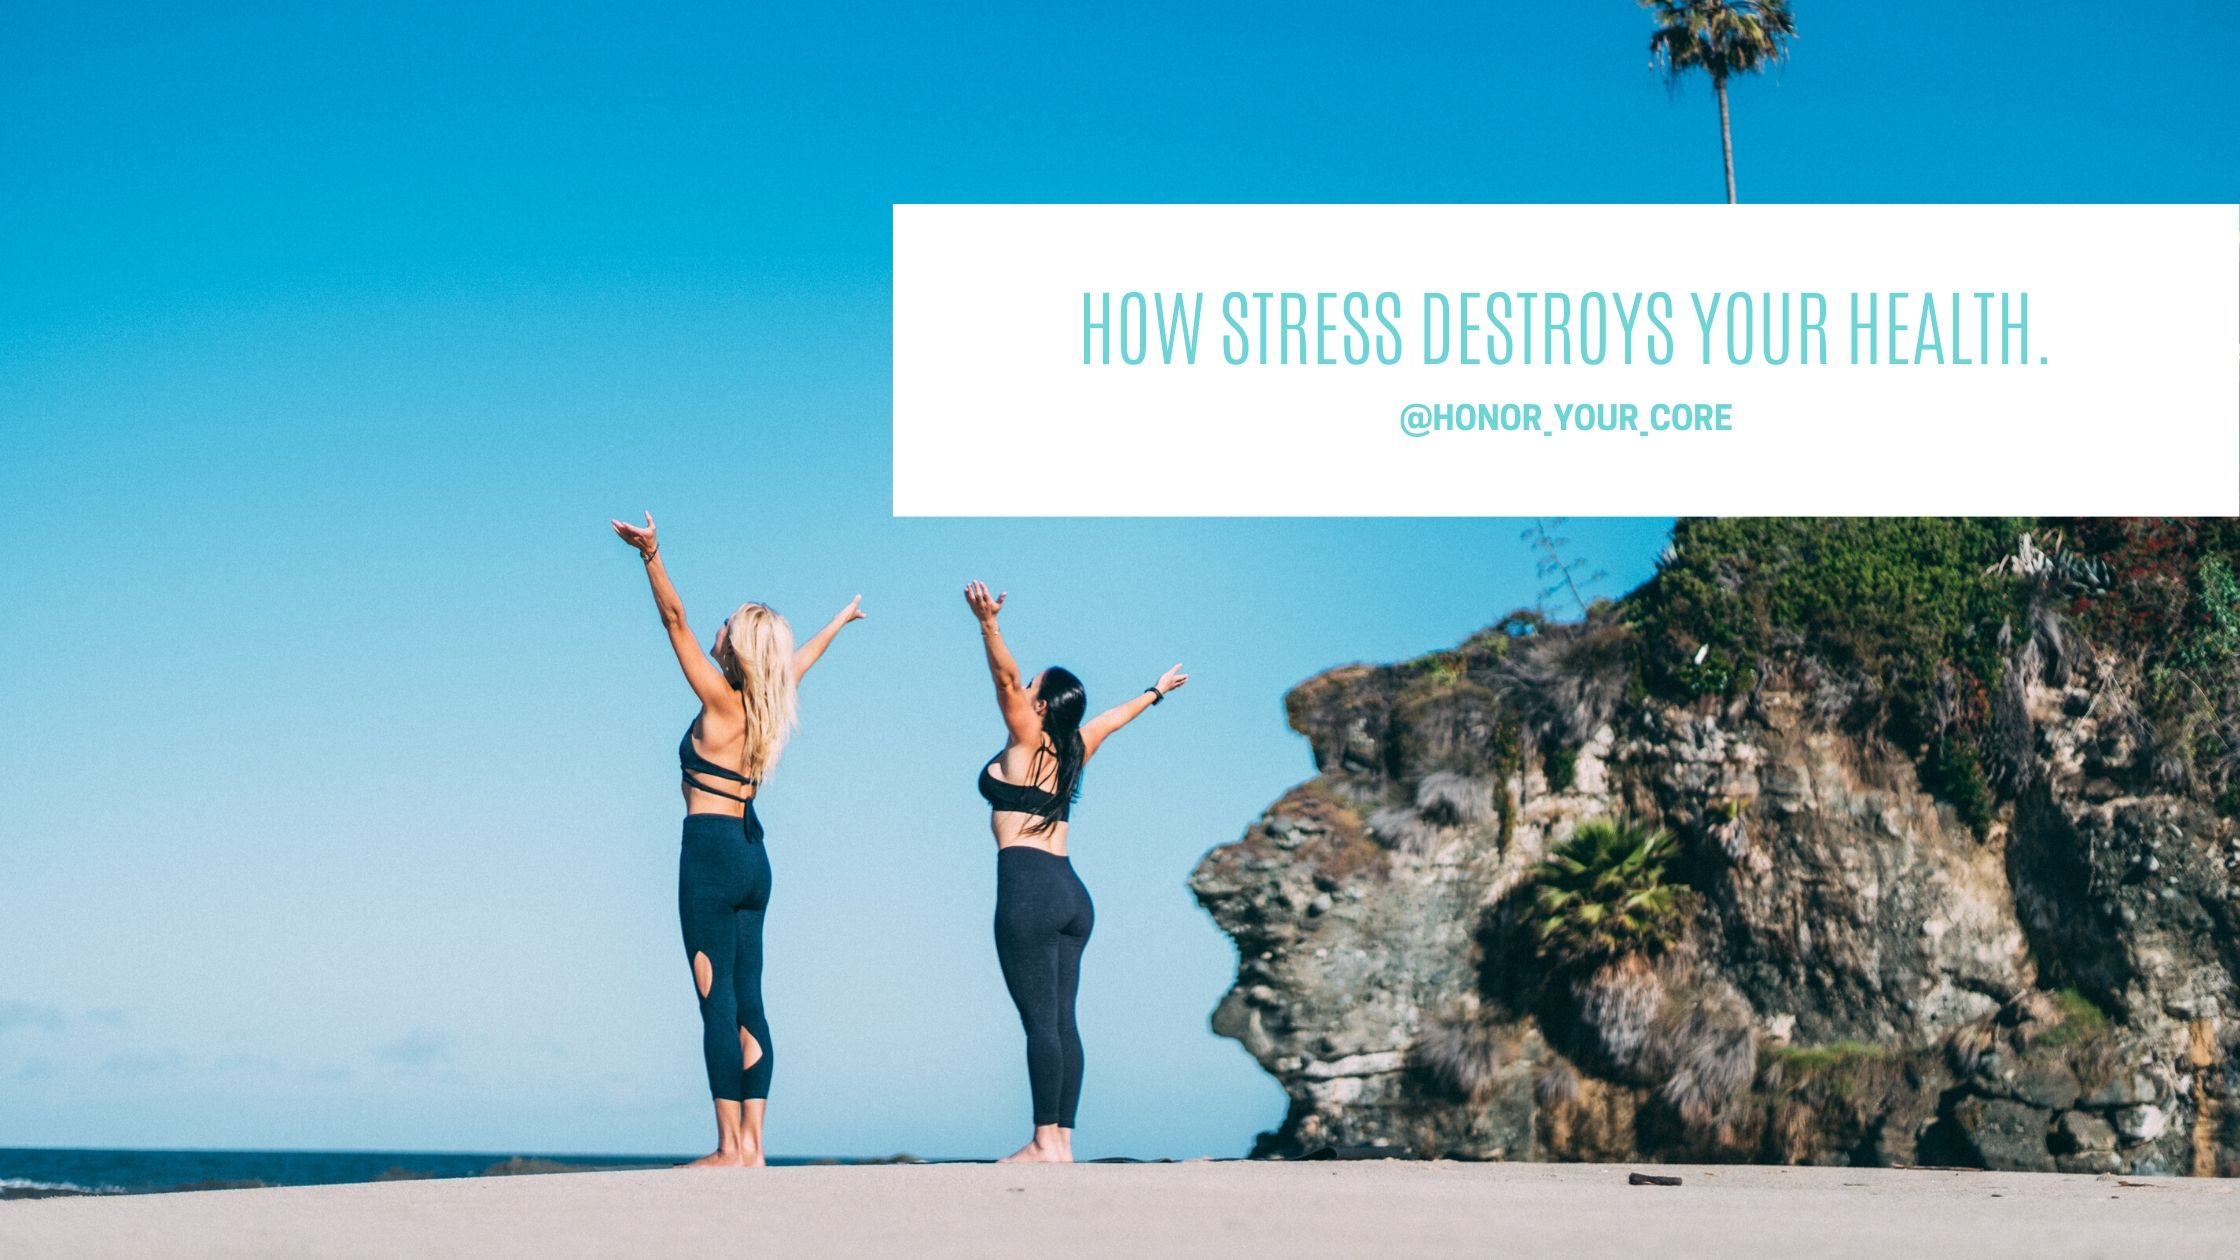 How Stress Destroys Your Health